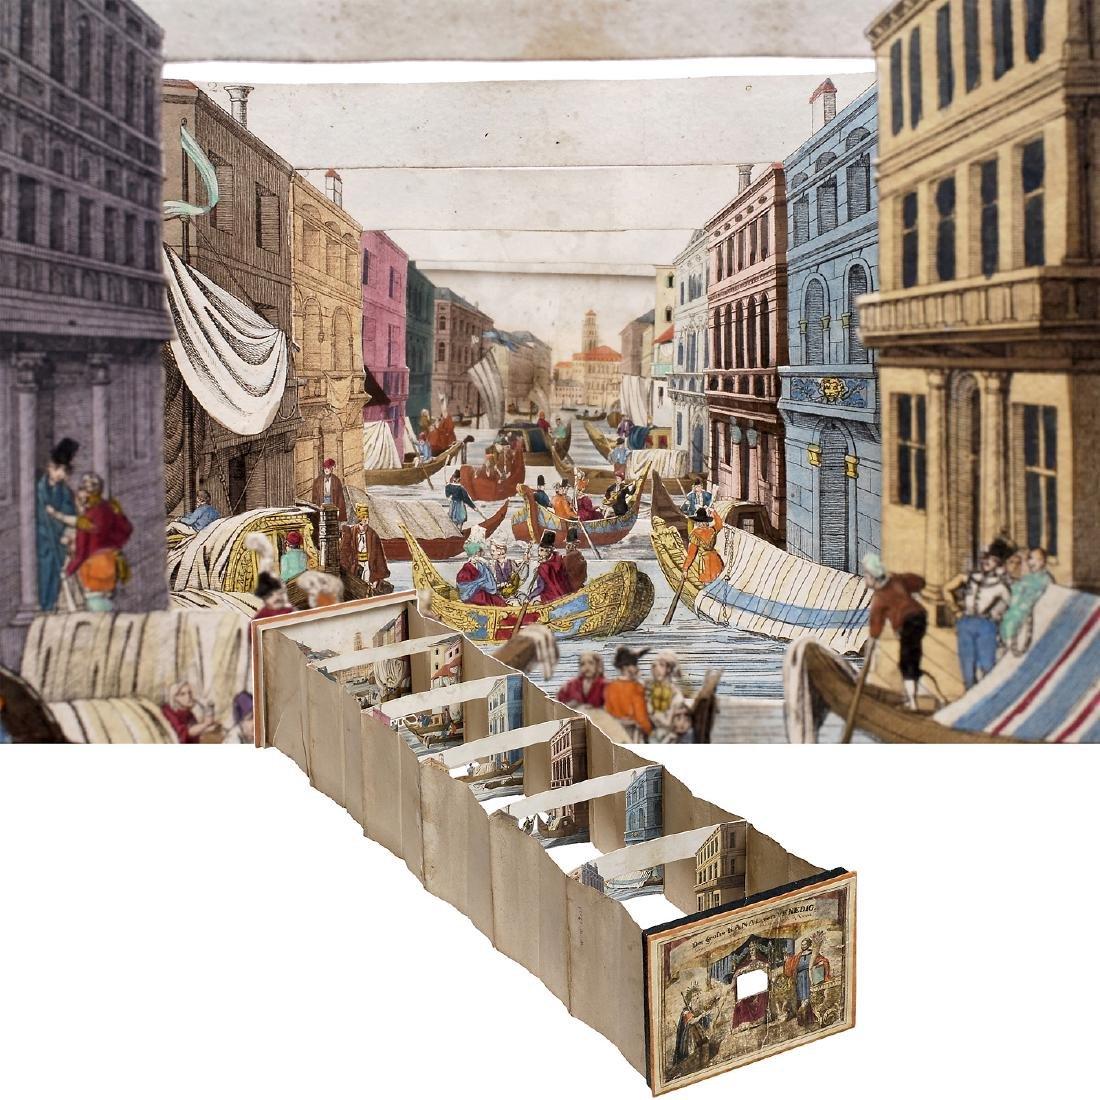 "Perspective Diorama ""Canale Grande in Venice"", c. 1860"